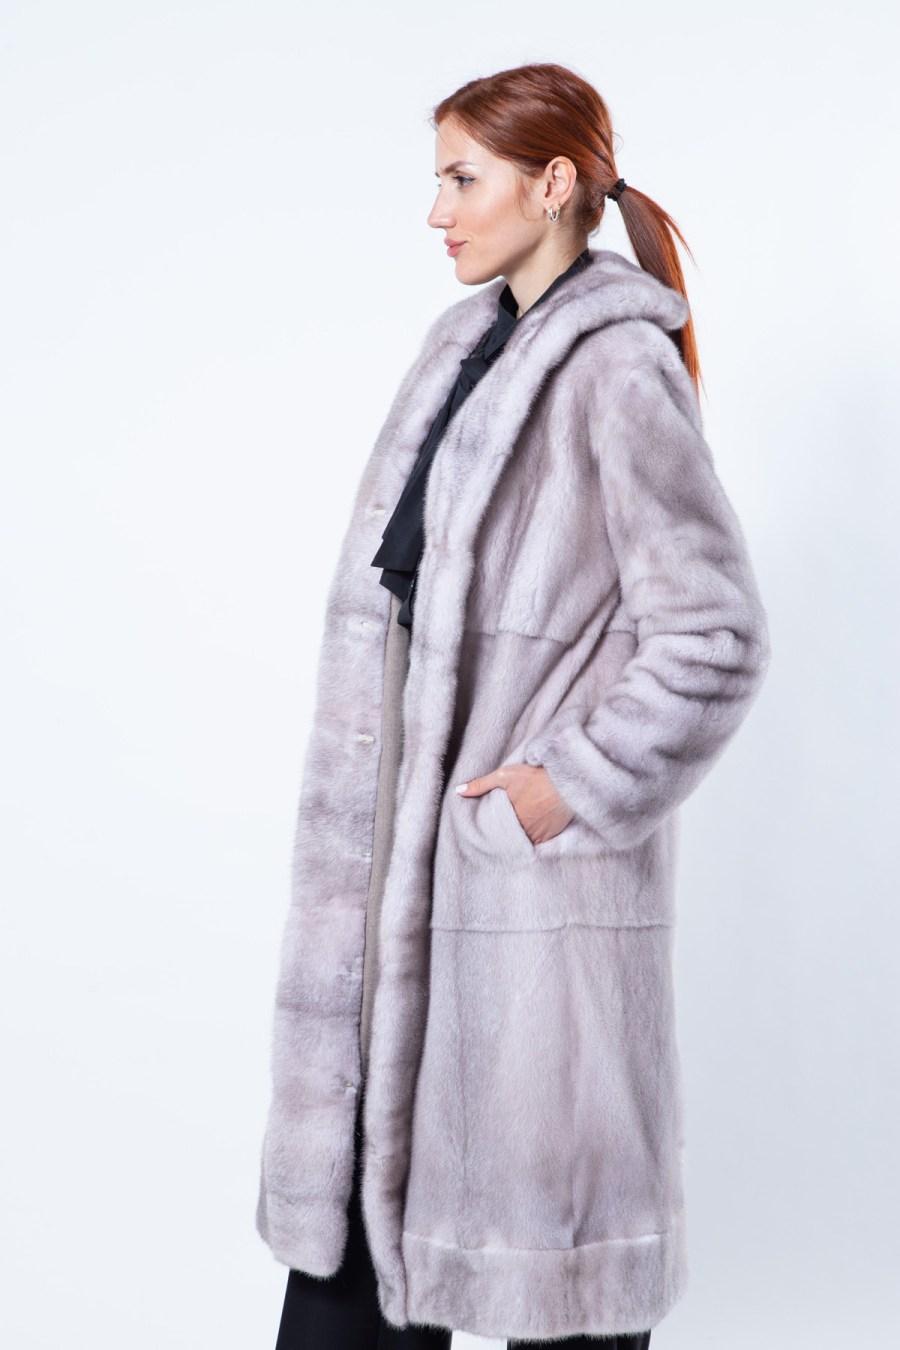 Double-faced Ice Fume Mink and Fabric Coat | Двусторонняя Шуба из норки цвета Ice Fume и ткани - Sarigianni Furs